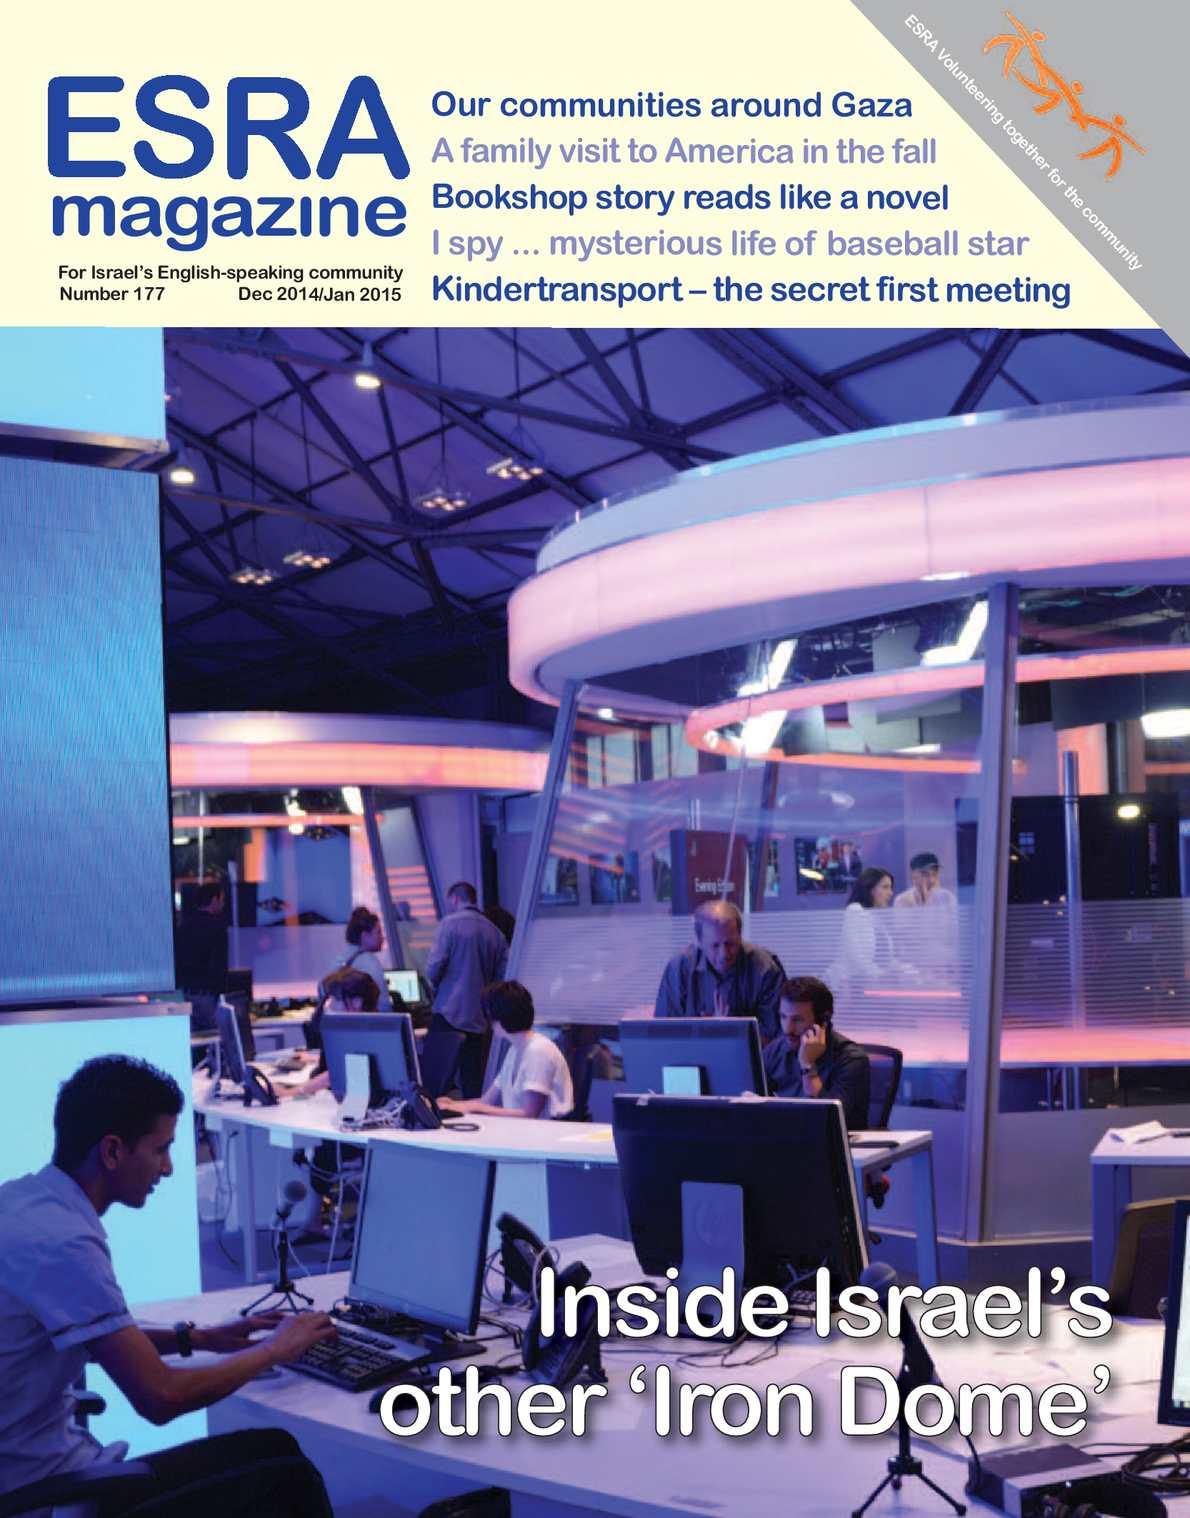 Calaméo - ESRA magazine 177